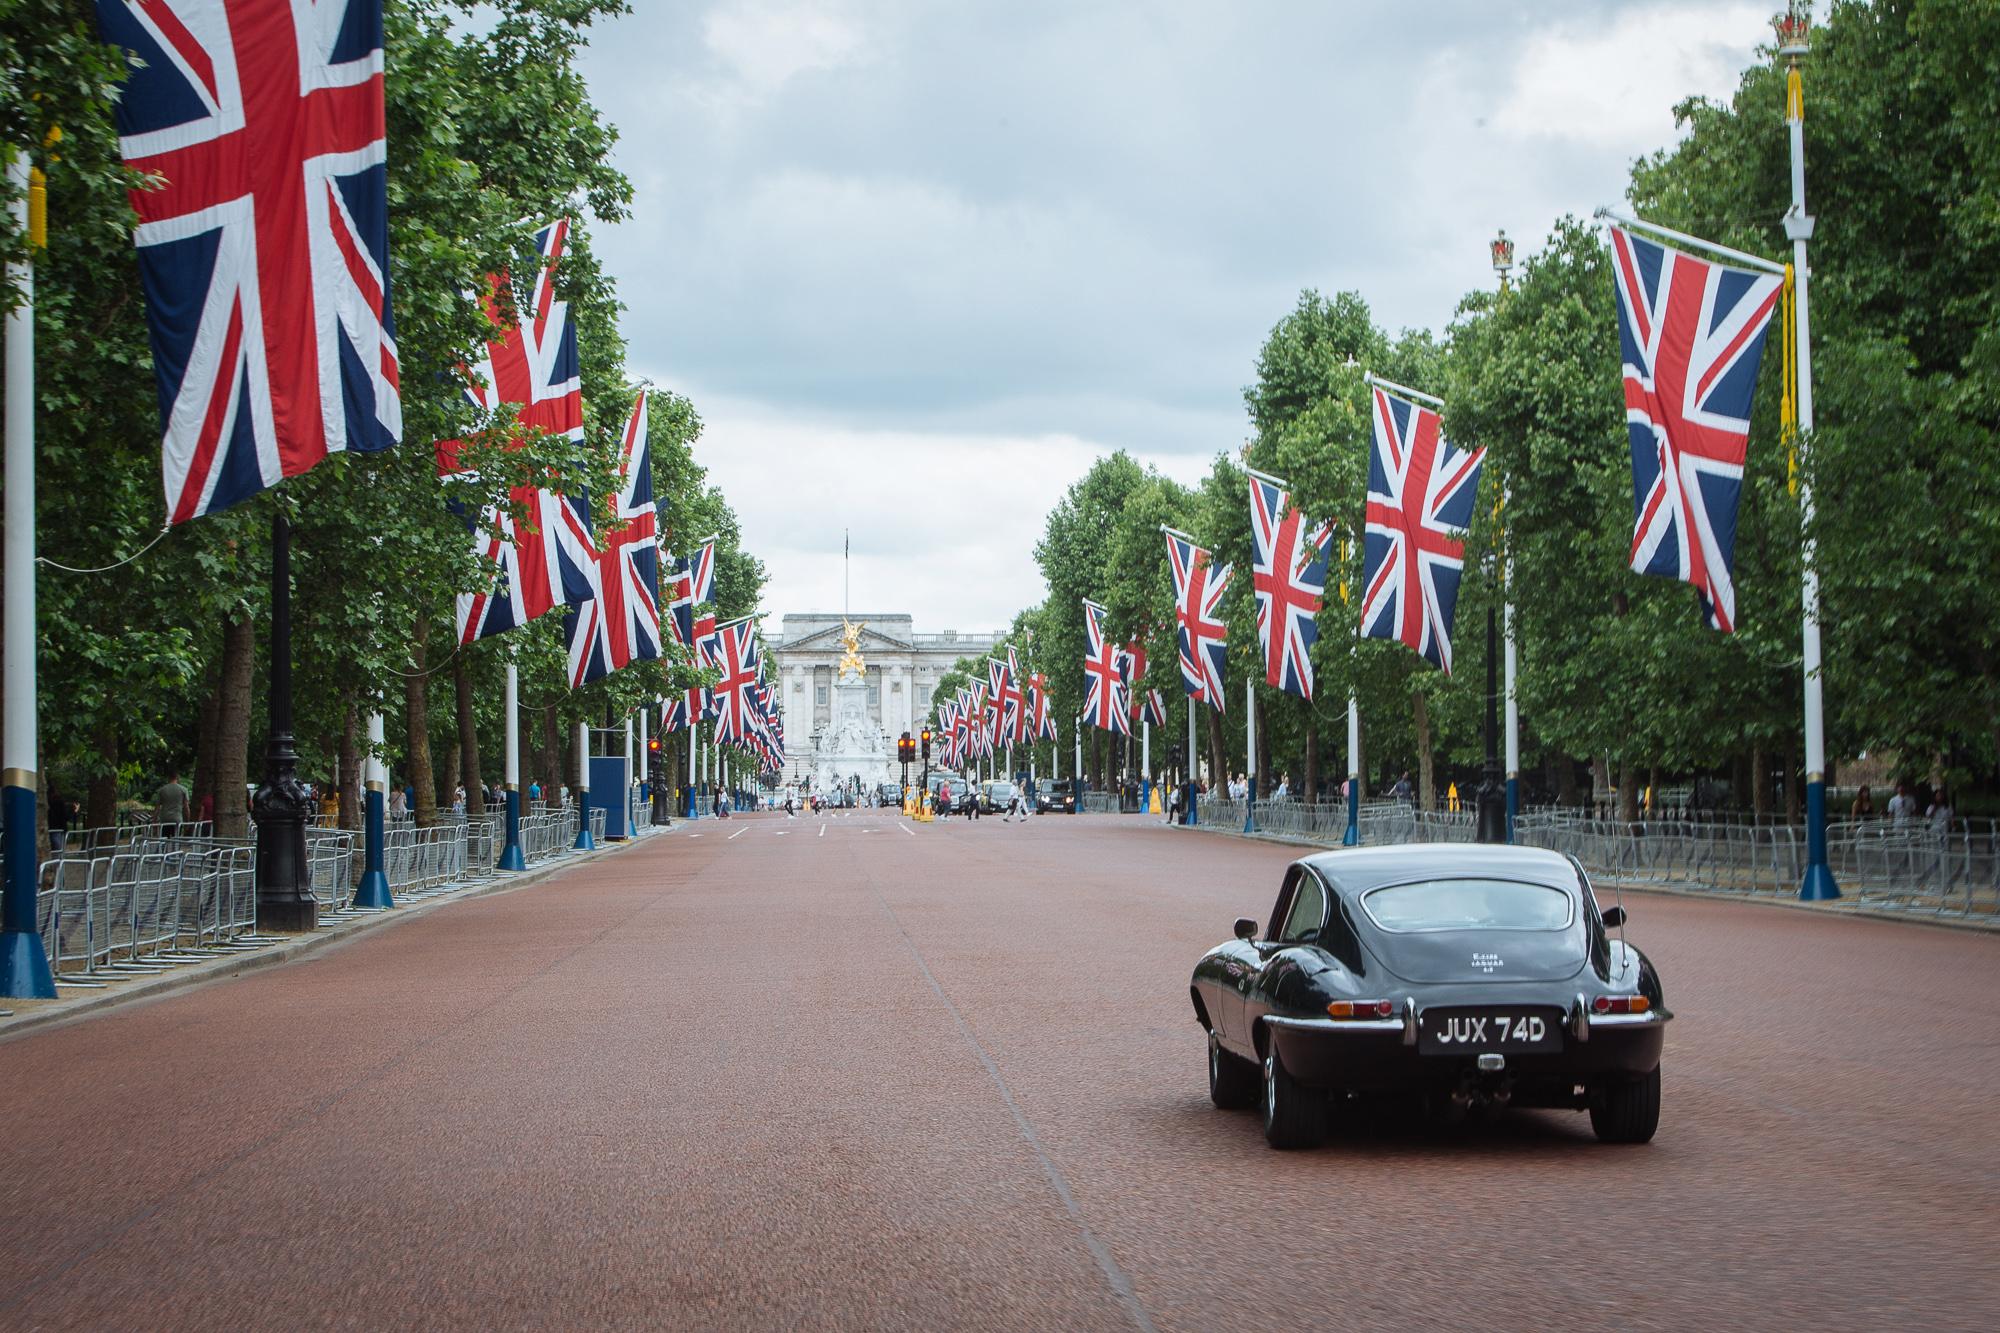 Gideon_Lang_Laddie_Gideons_Agency_Roadshow_London_Events_Photographer-43.jpg